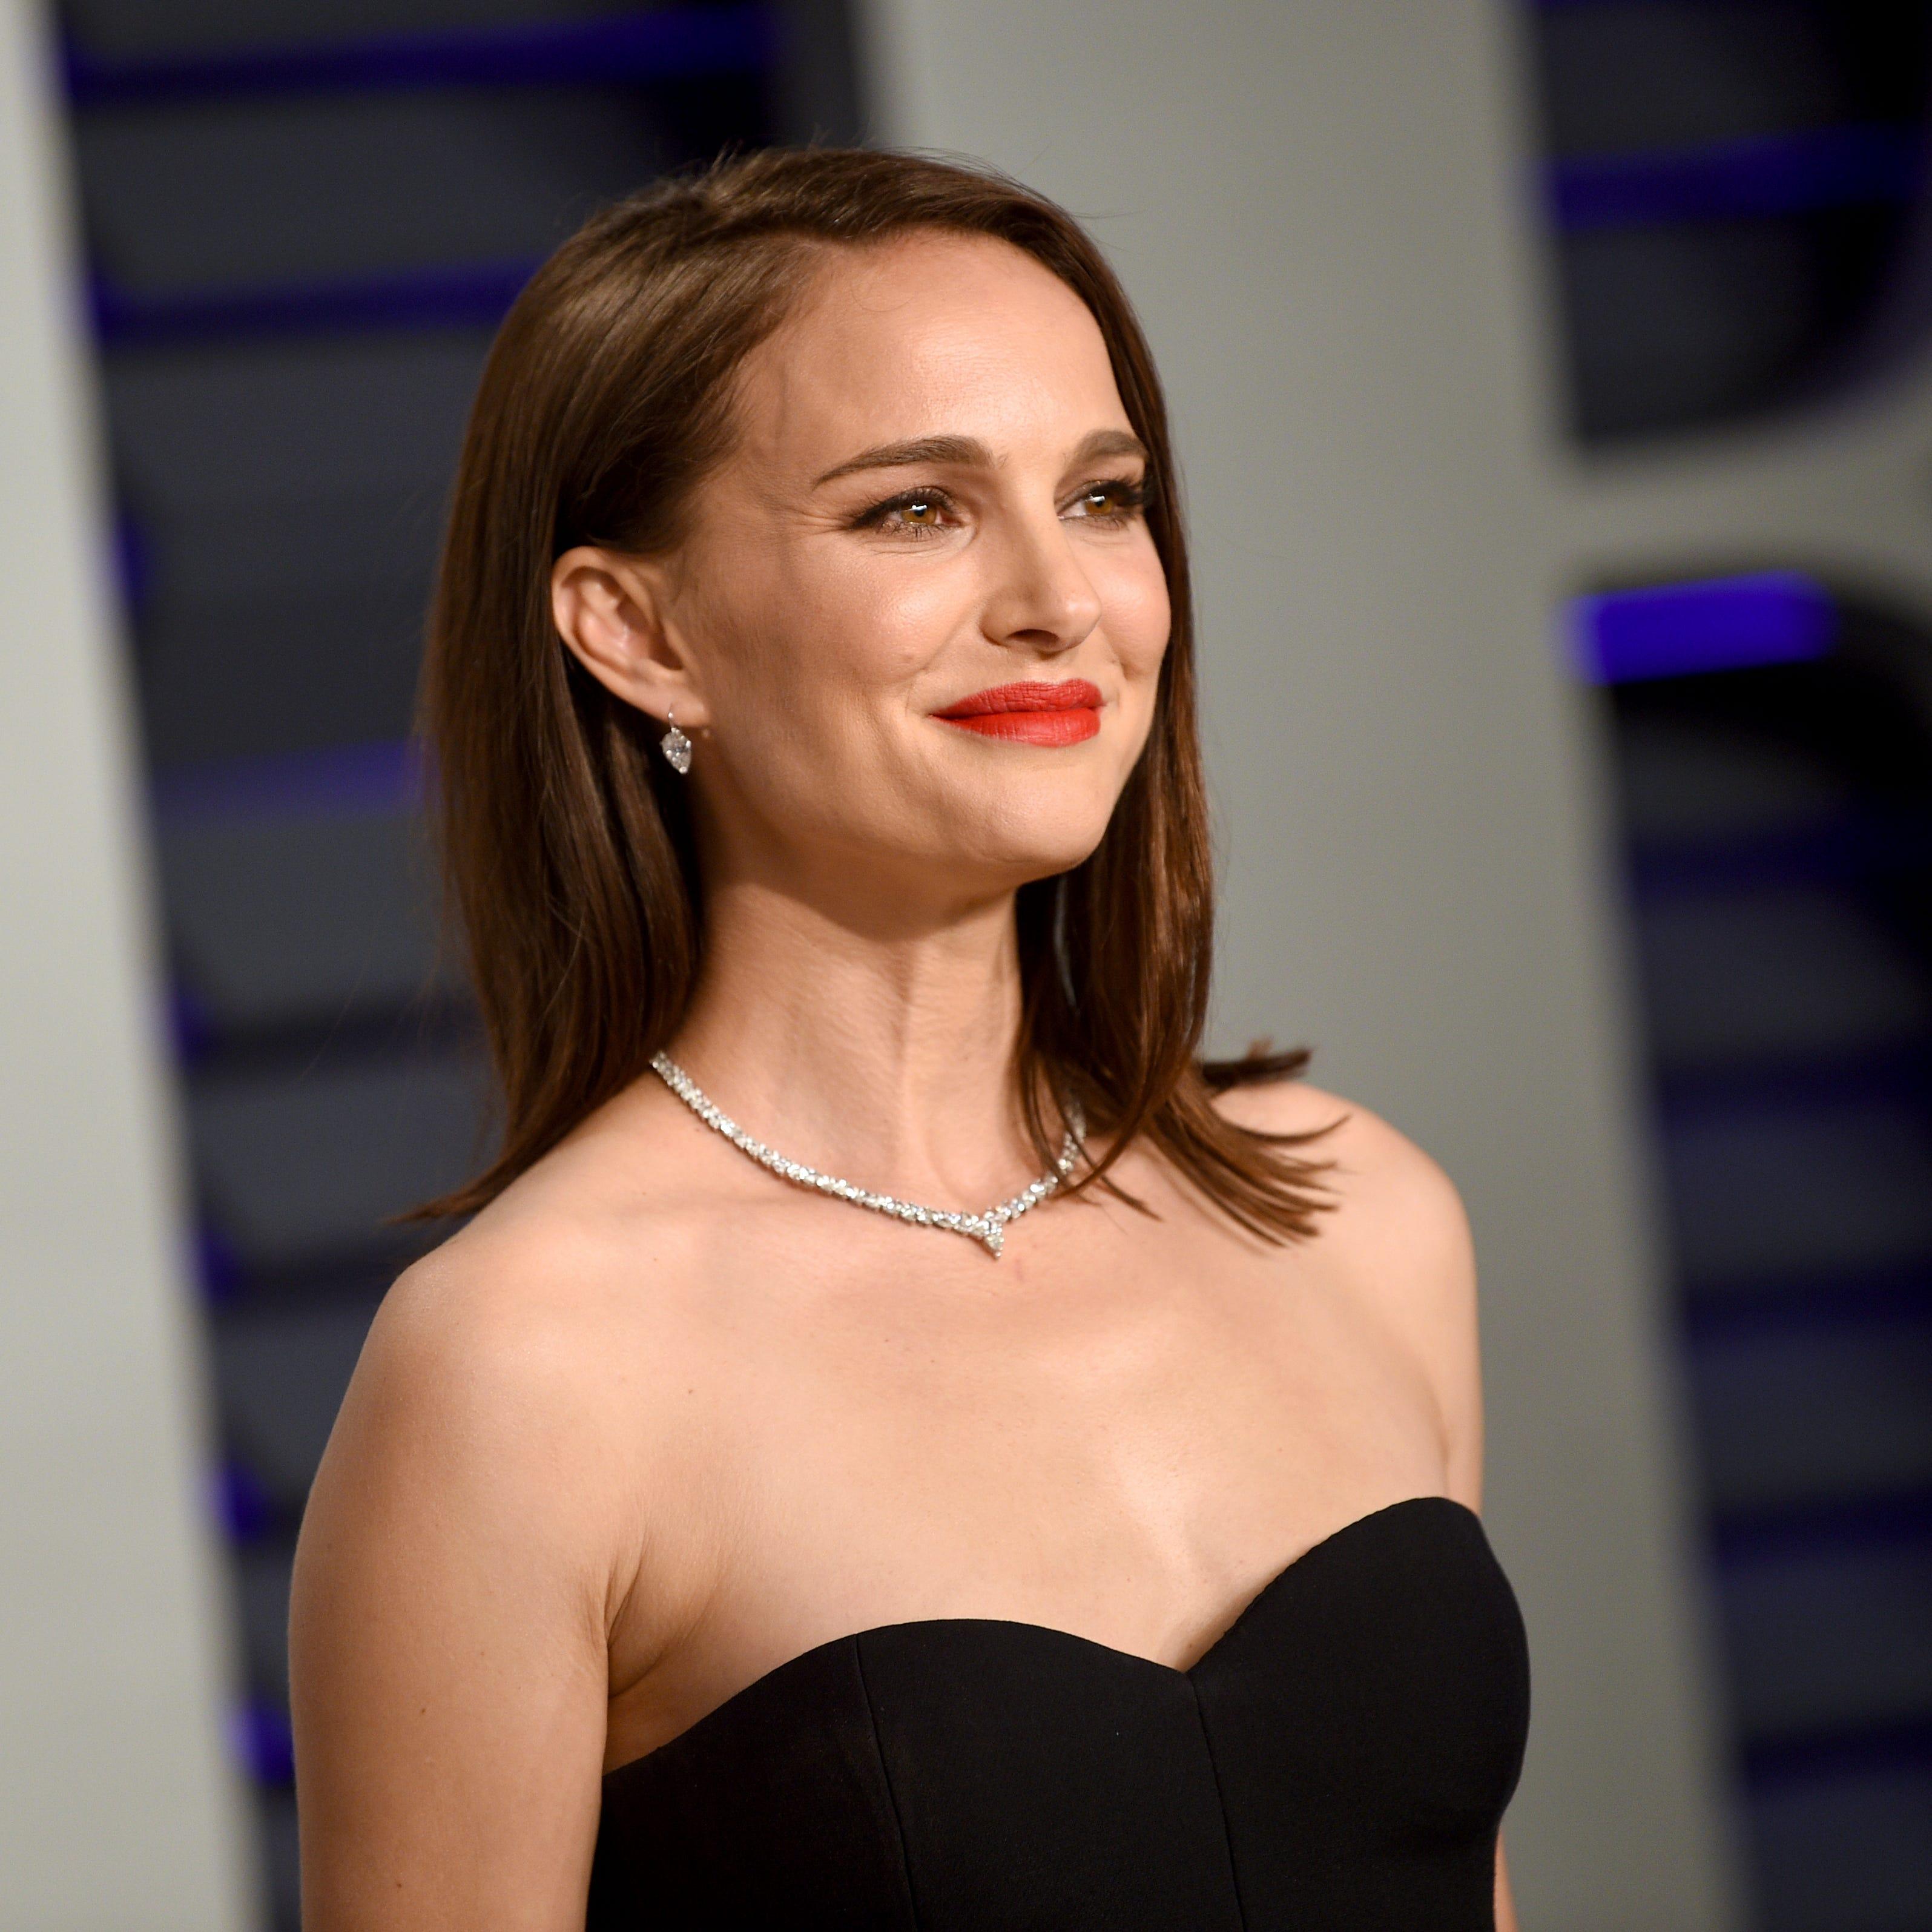 Natalie Portman to star in movie based on diaper-wearing astronaut Lisa Nowak